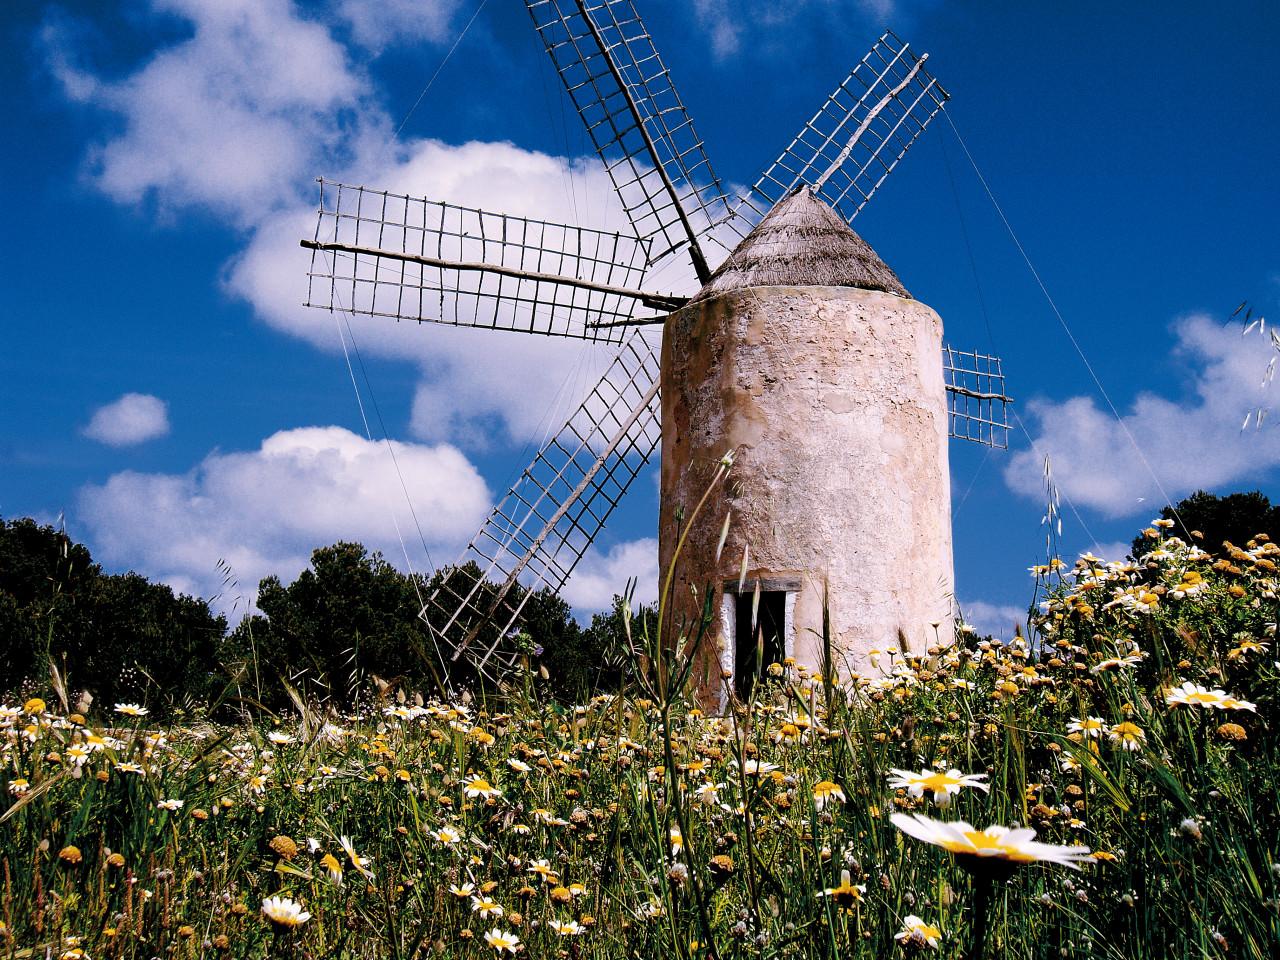 Molí Vell - Vieux moulin.